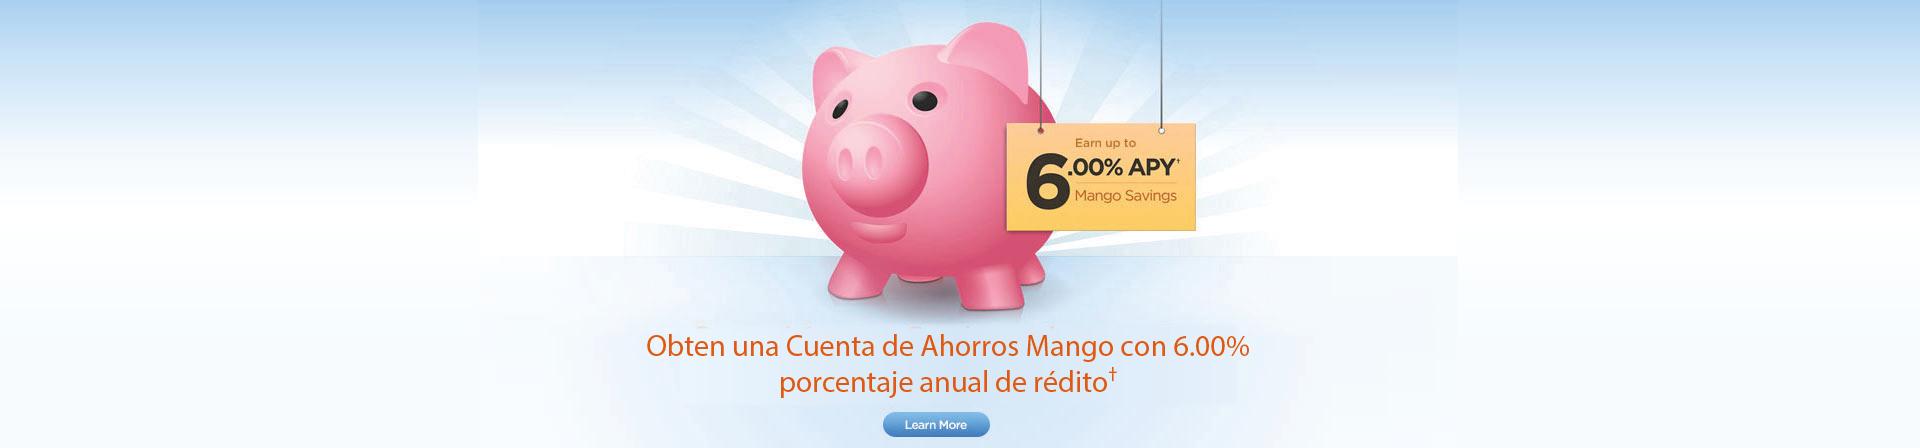 mango_website-images_SP_Artboard-20